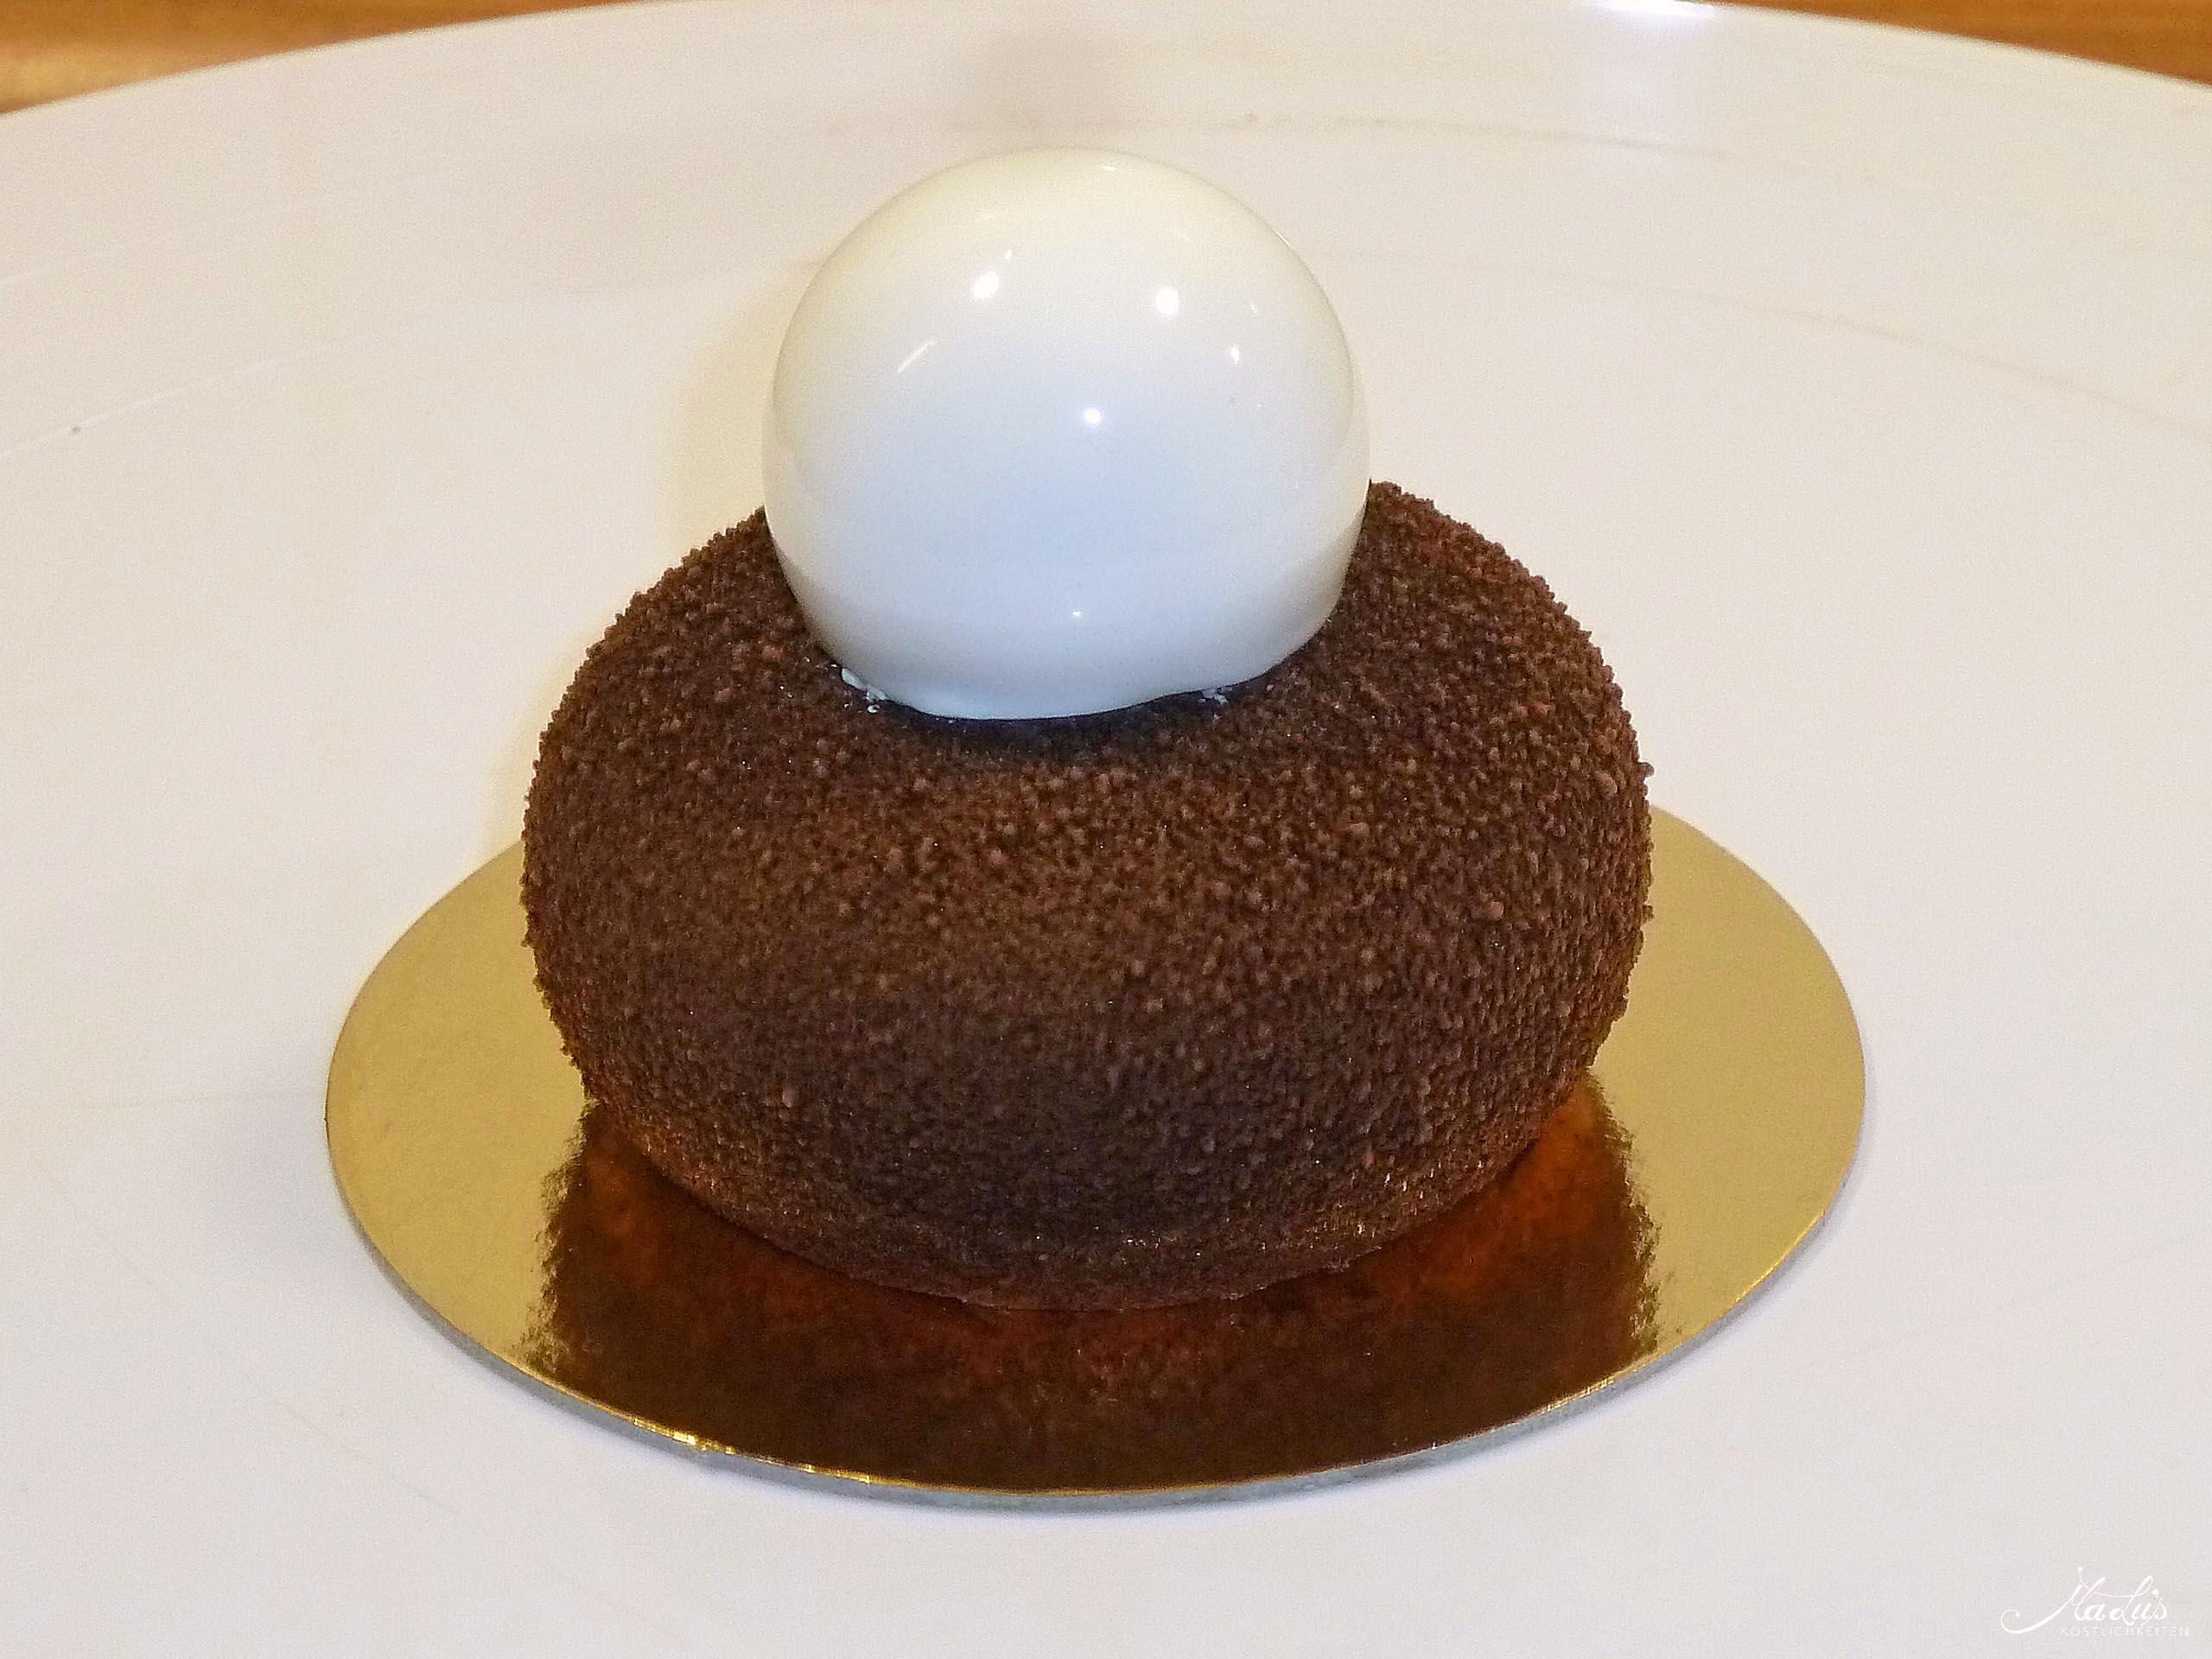 mousse-au-chocolat-to%cc%88rtchen-mit-timutpfeffer_0011